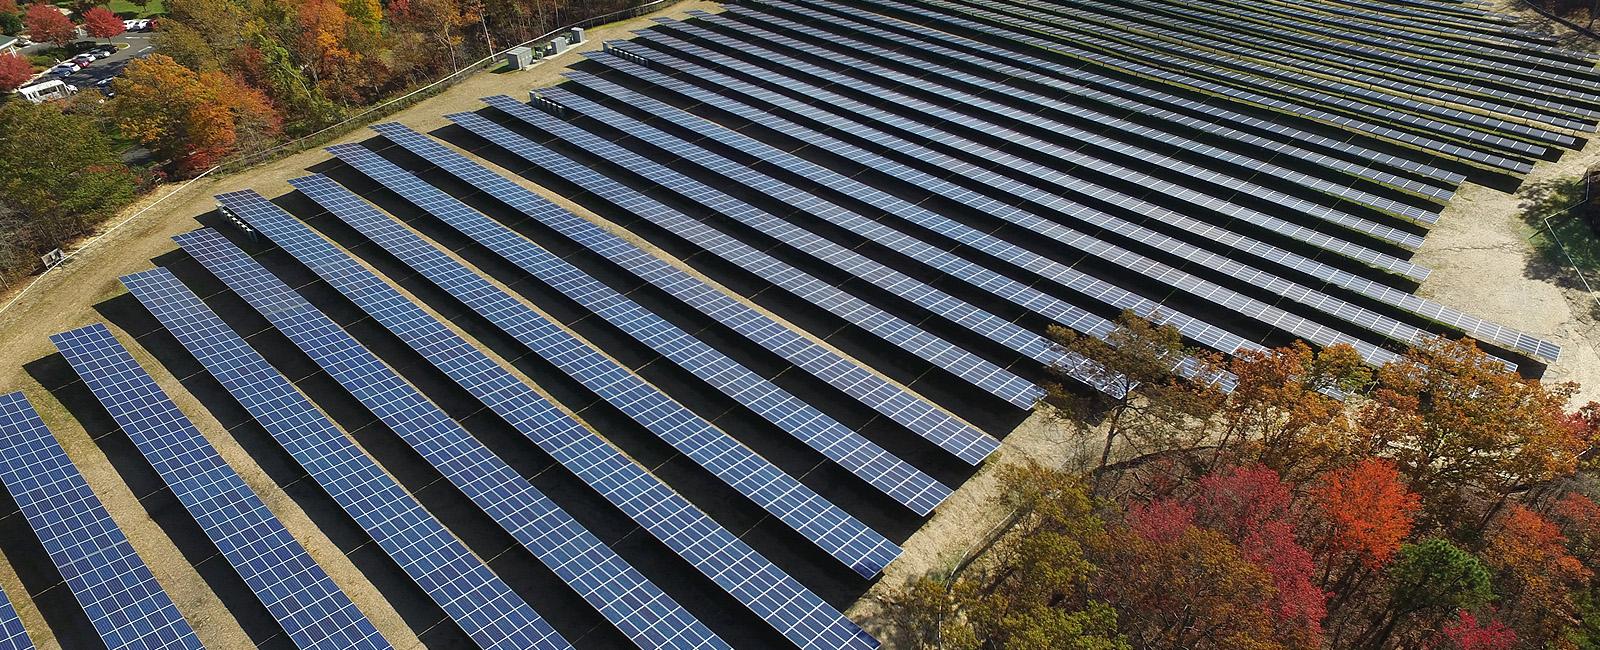 Seabrook Village Solar Project